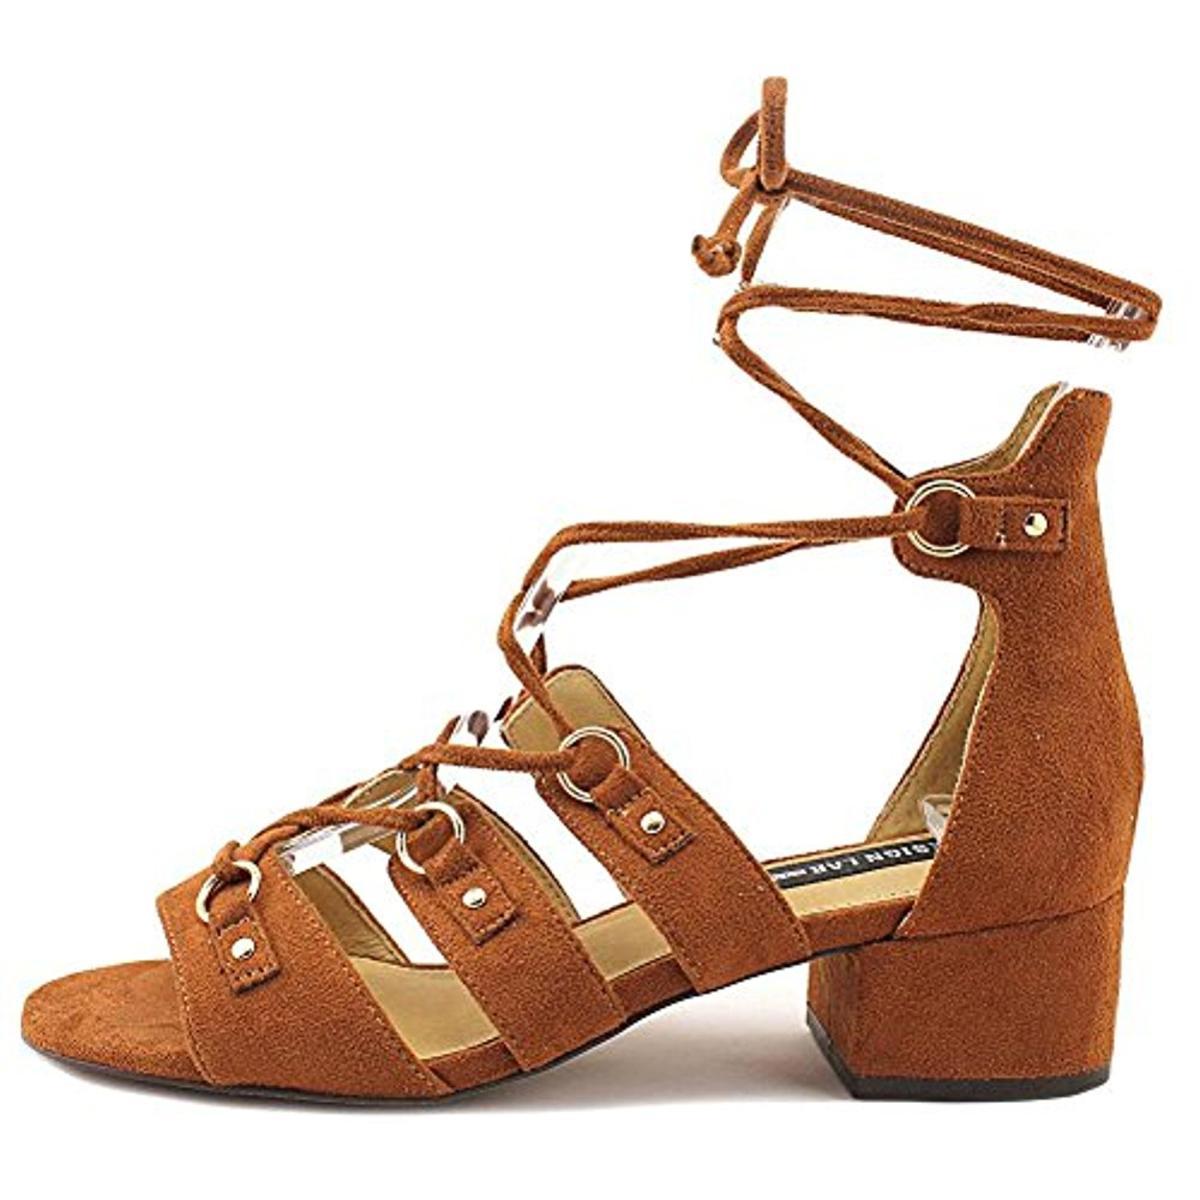 Design-Lab-Womens-Eldy-Block-Heel-Dress-Sandals-Shoes-BHFO-2676 thumbnail 7